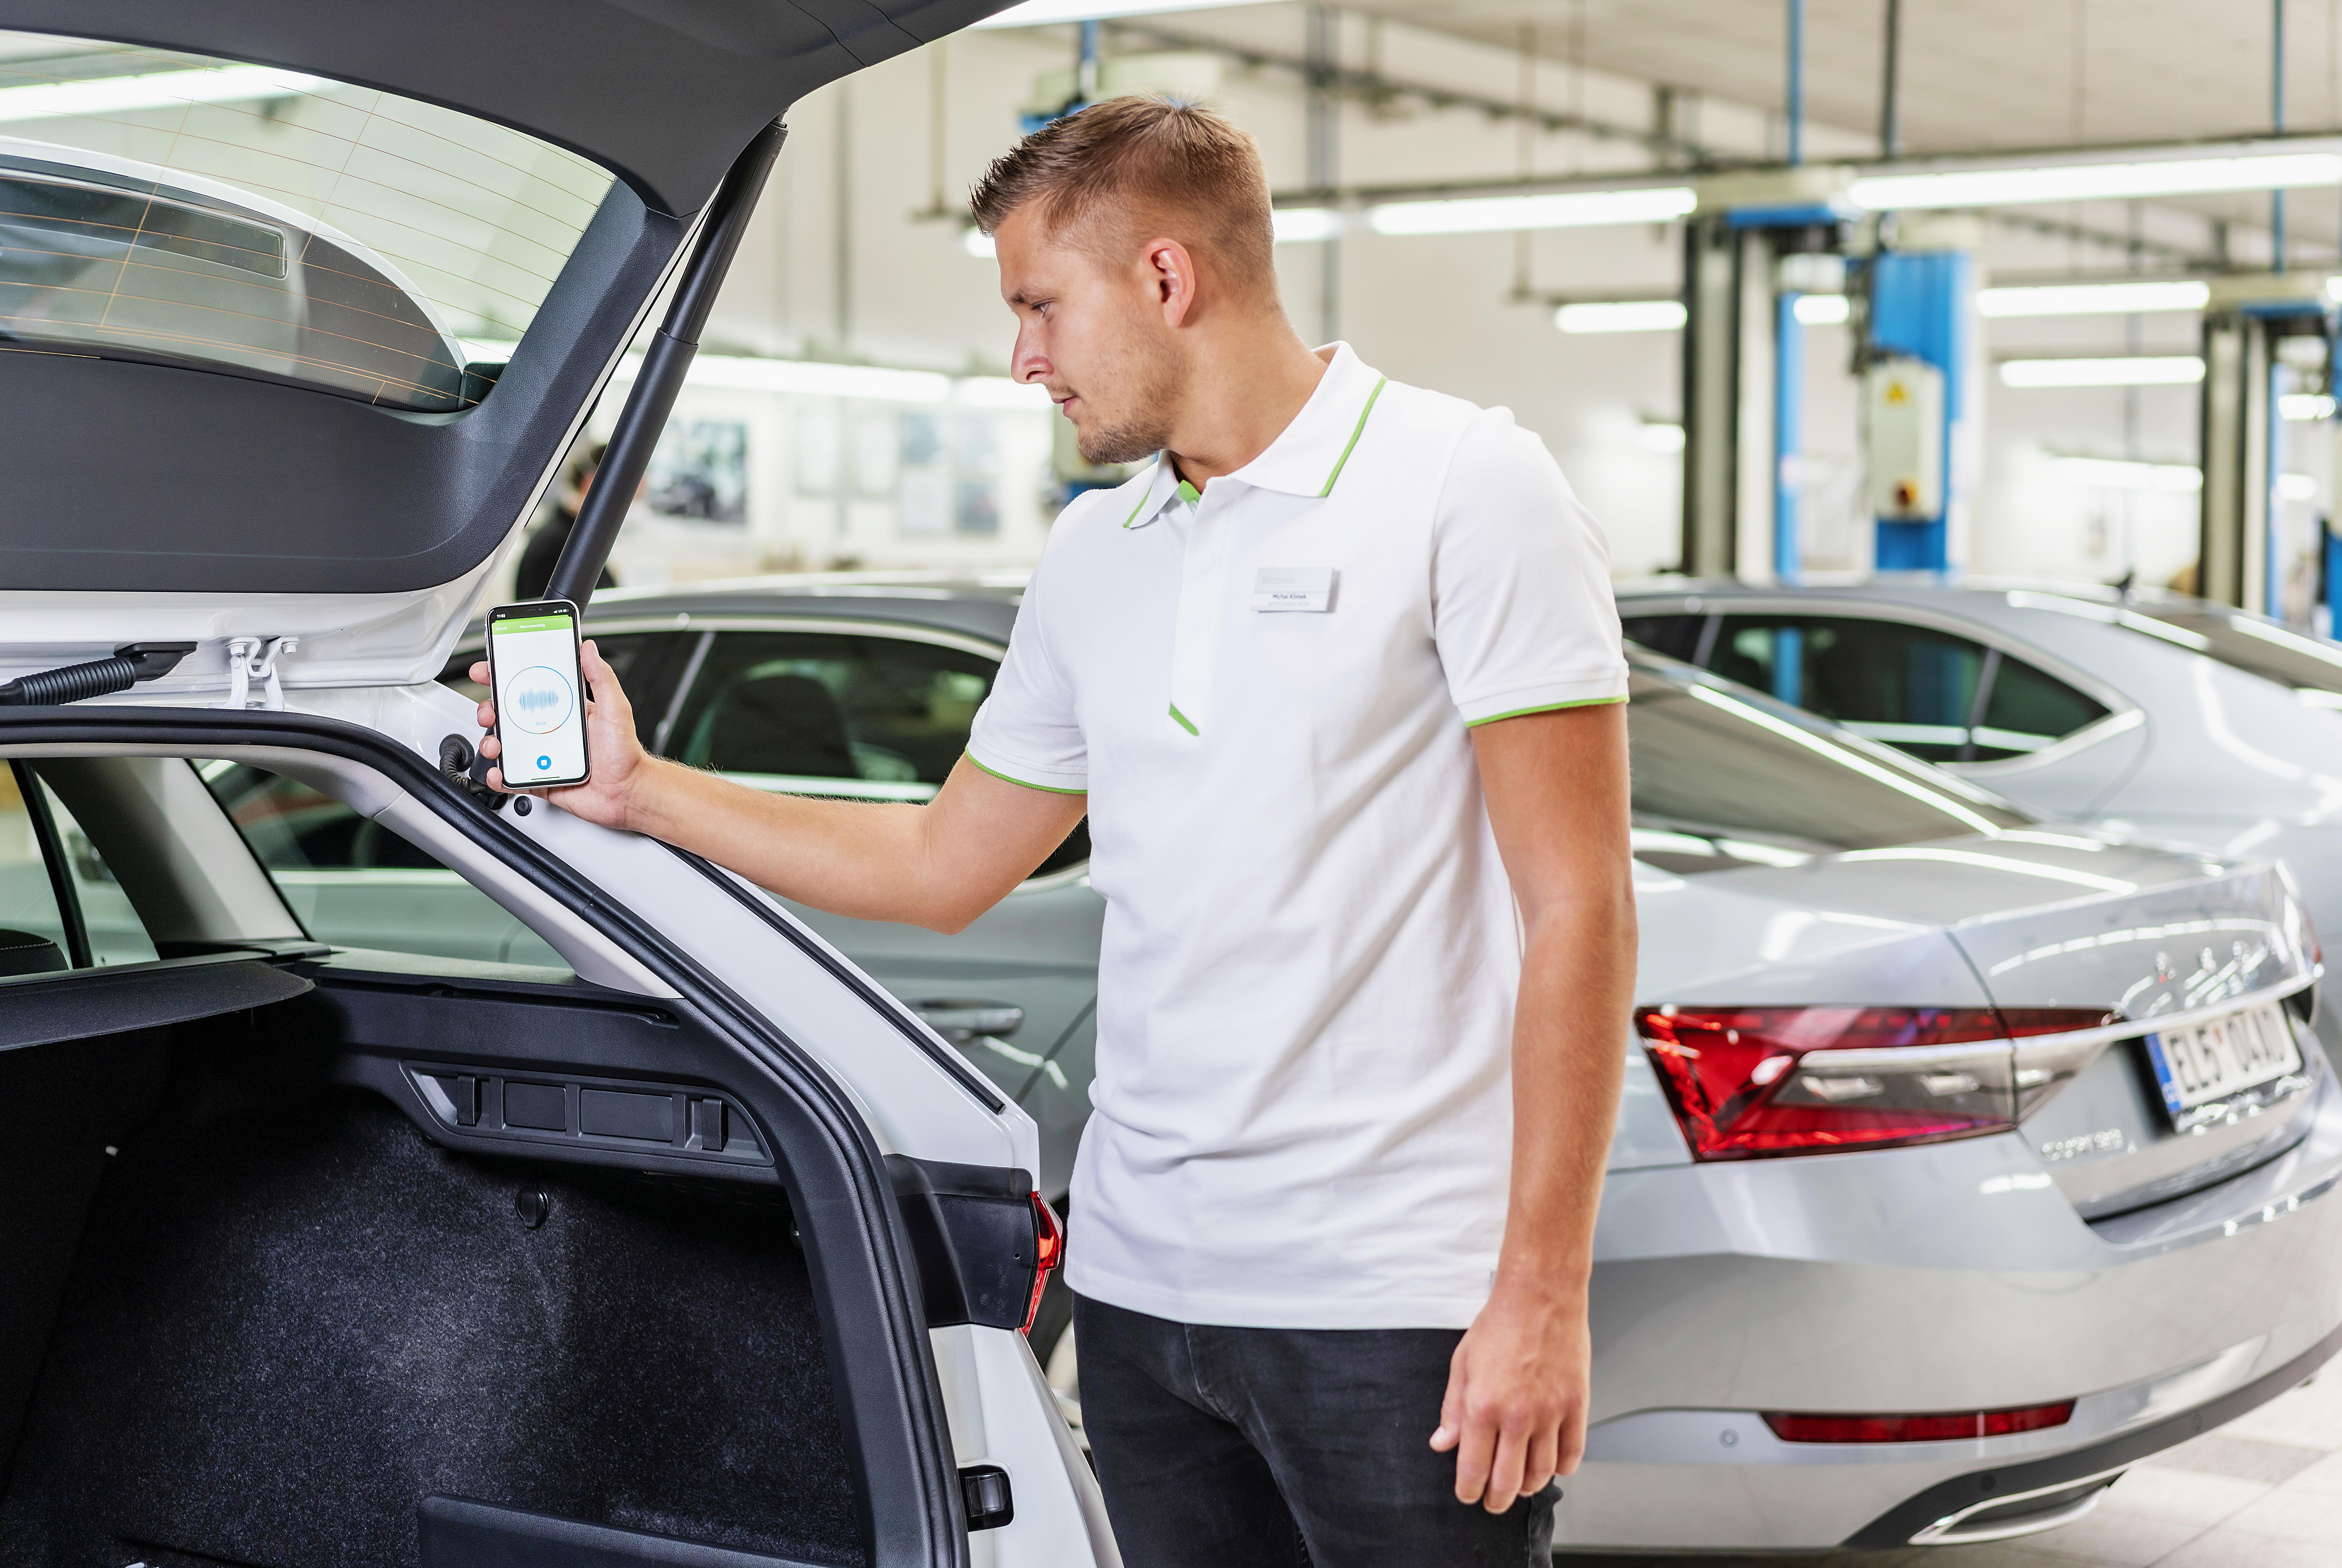 SKODA AUTO uses artificial intelligence for even more accurate car diagnostics - Image 3